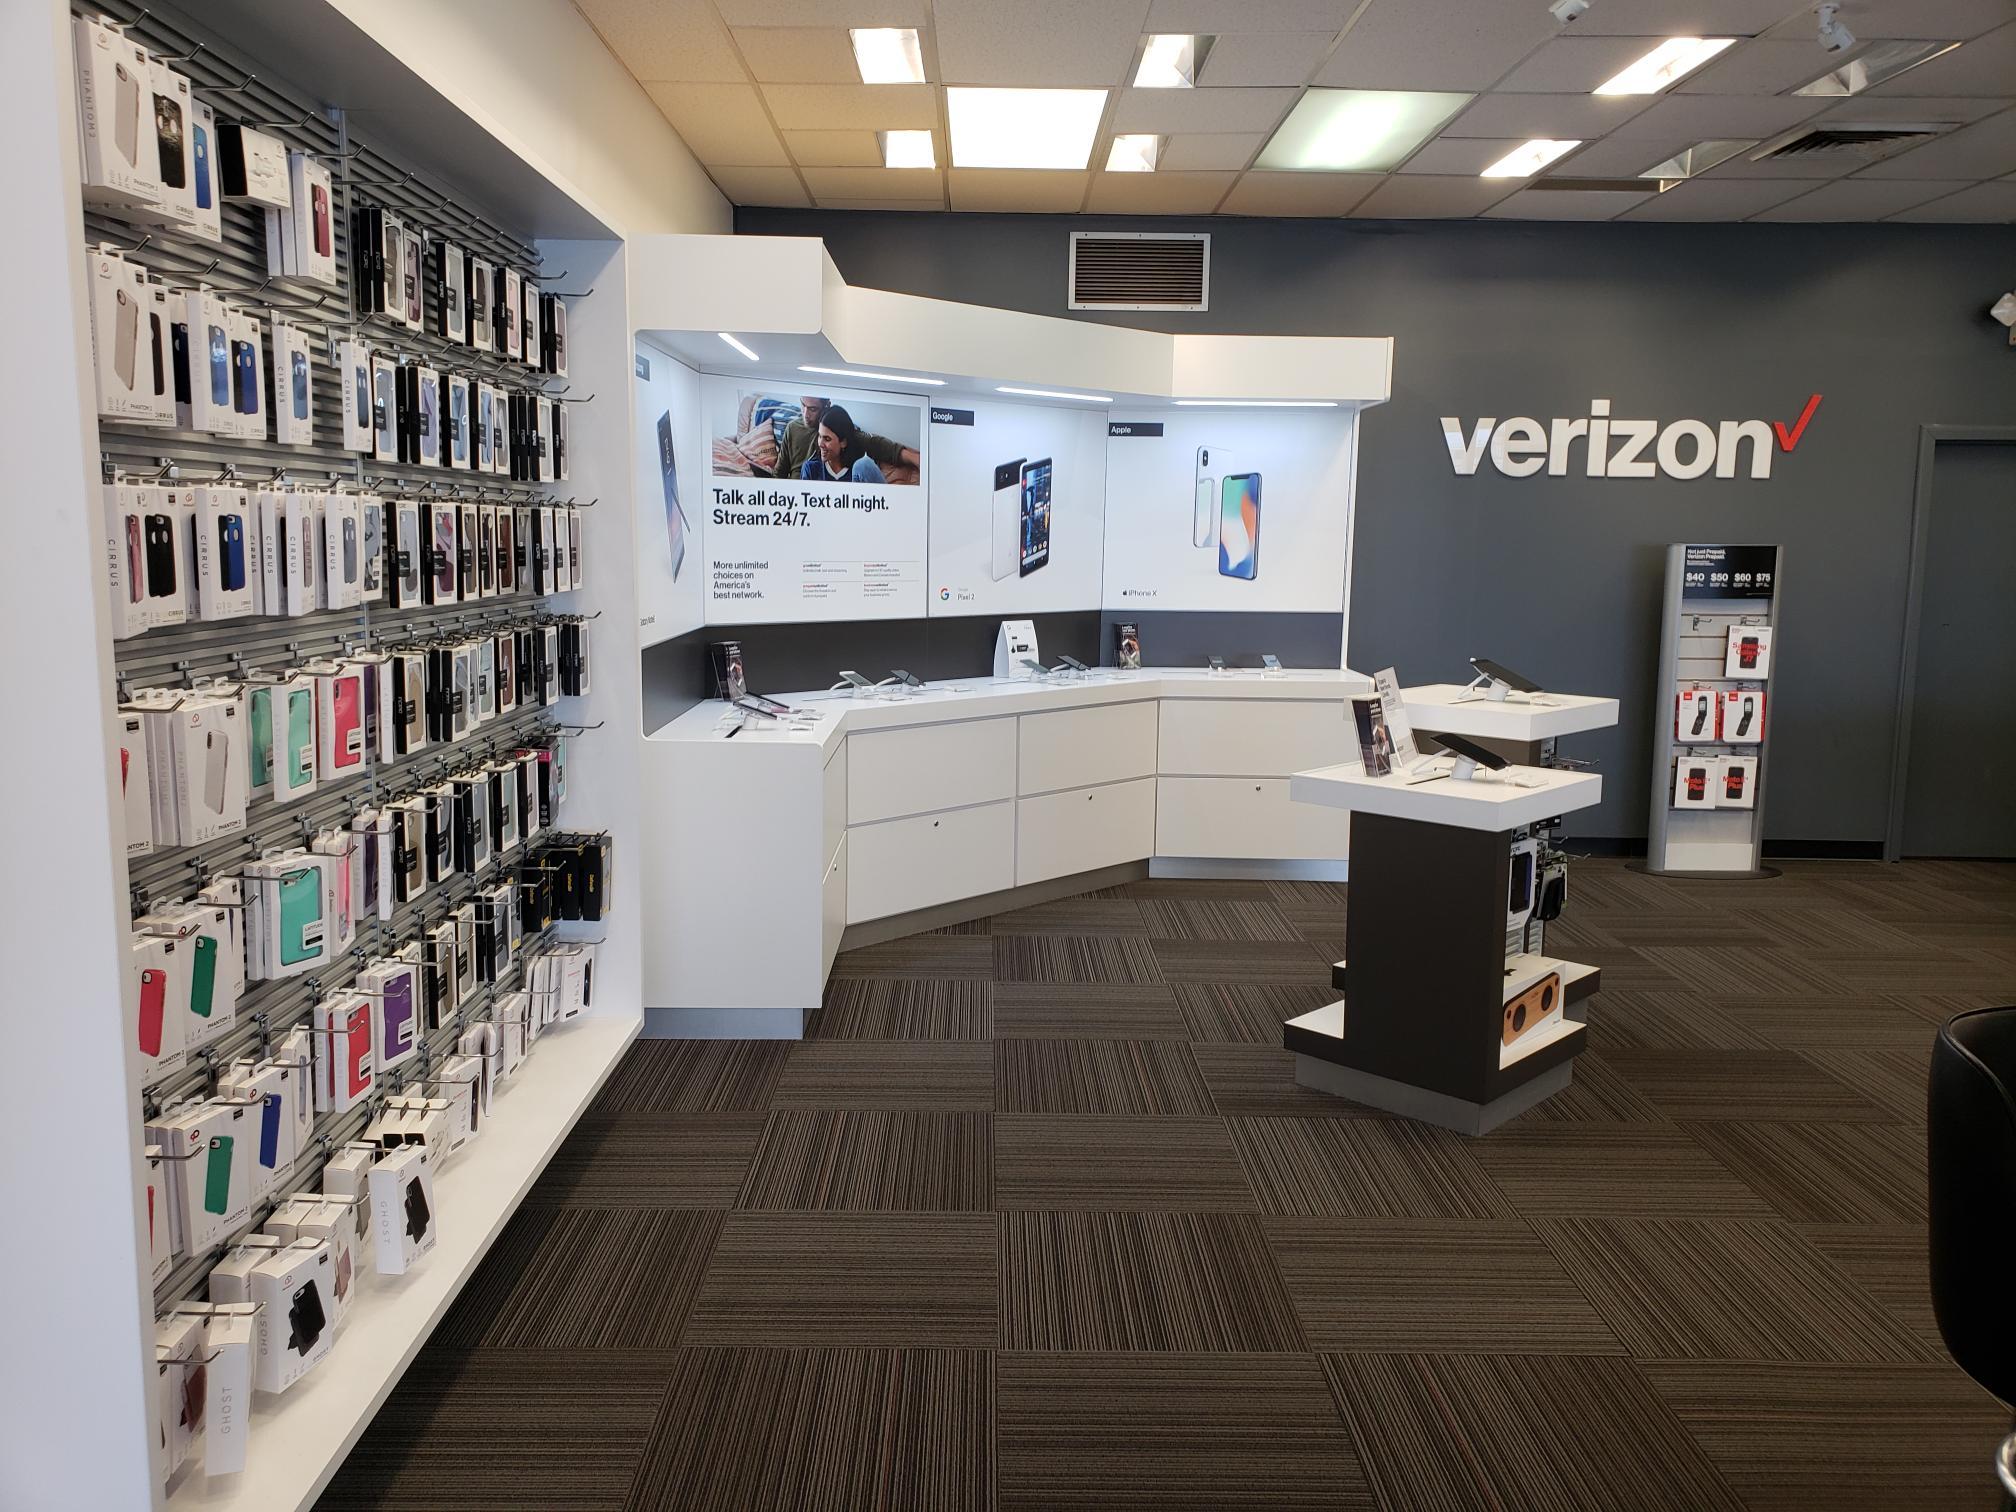 Verizon Authorized Retailer – TCC image 15